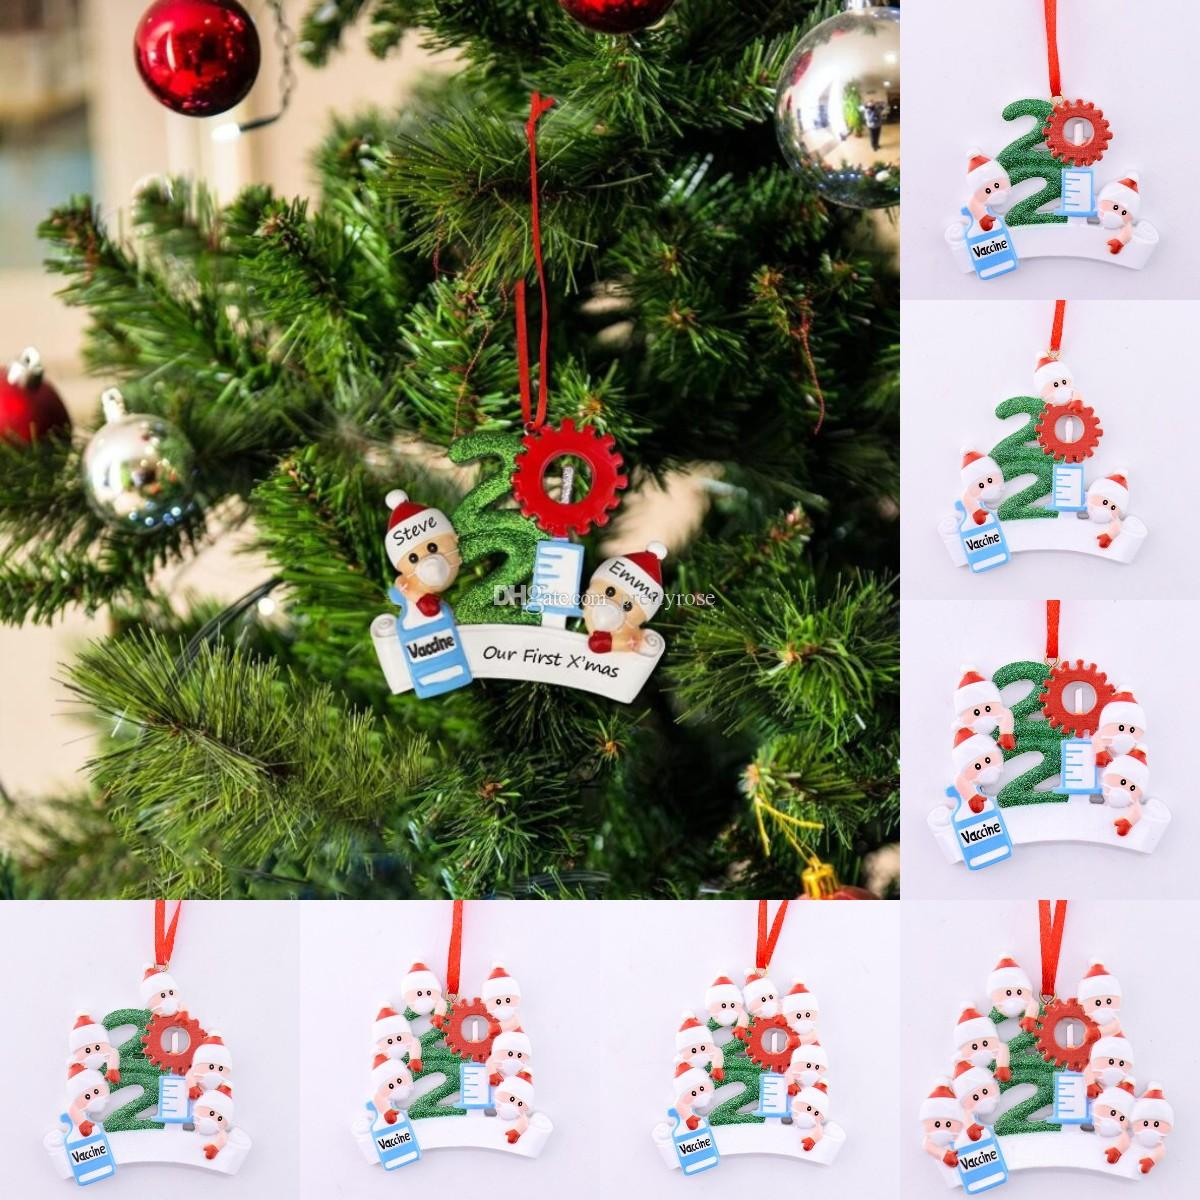 Hot Nuevo 2021 Decoración navideña Adornos de cuarentena Familia de 1-9 cabezas DIY Árbol Accesorios colgantes con resina de cuerda roja